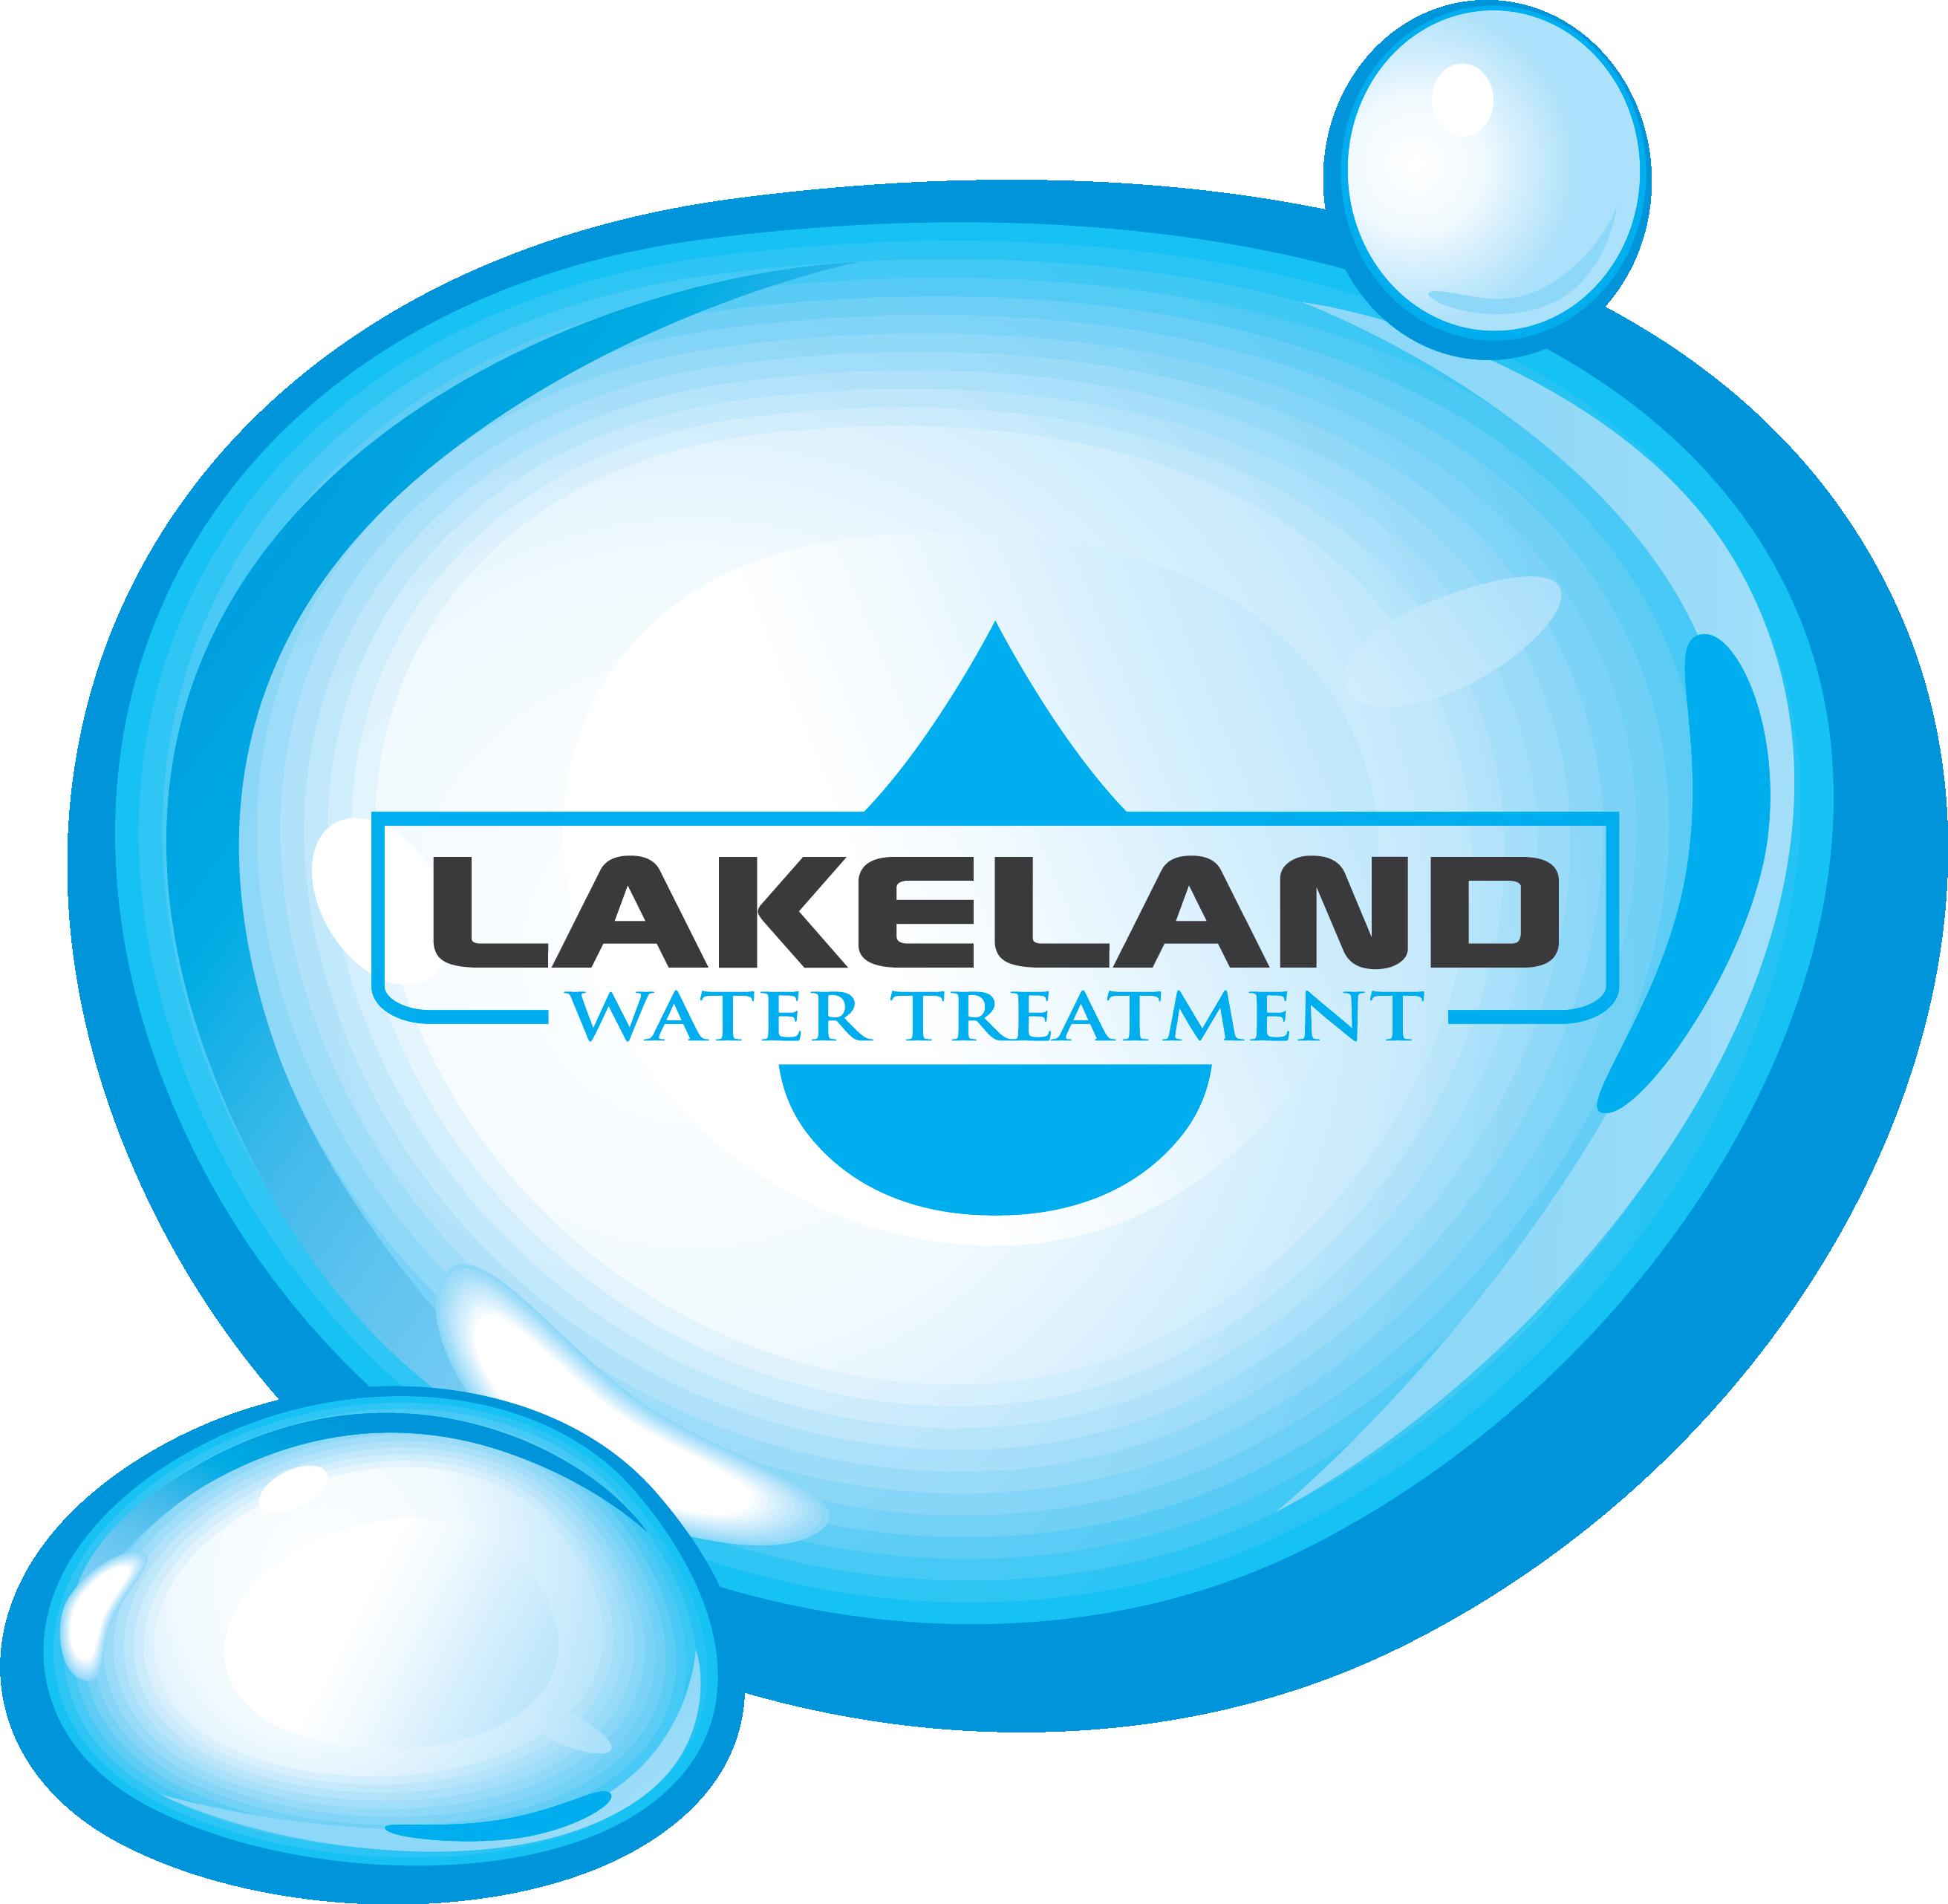 Lakeland Water Treatment